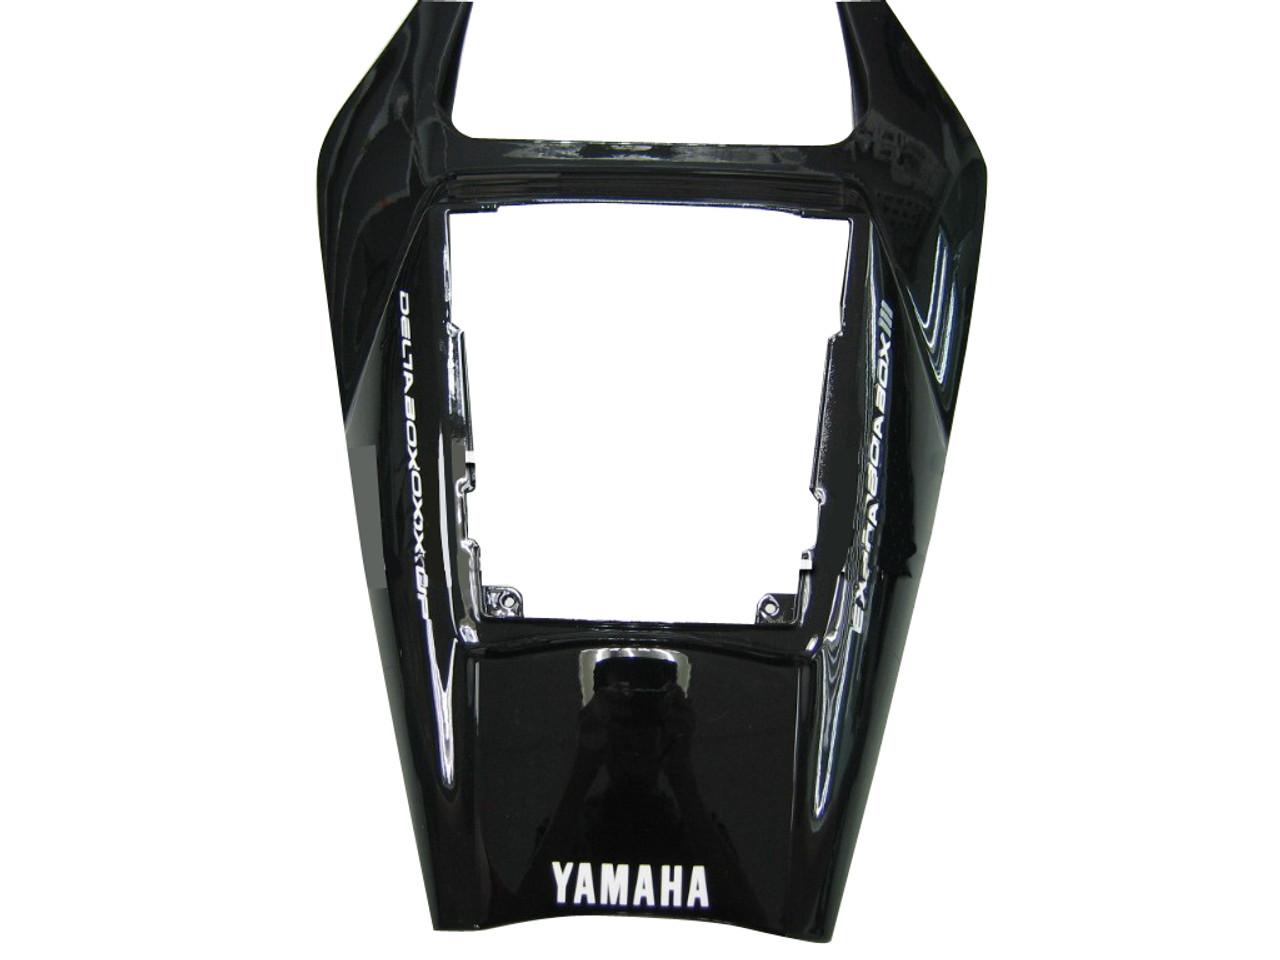 Fairings Yamaha YZF-R1 Contrast Black R1 Racing (2002-2003)